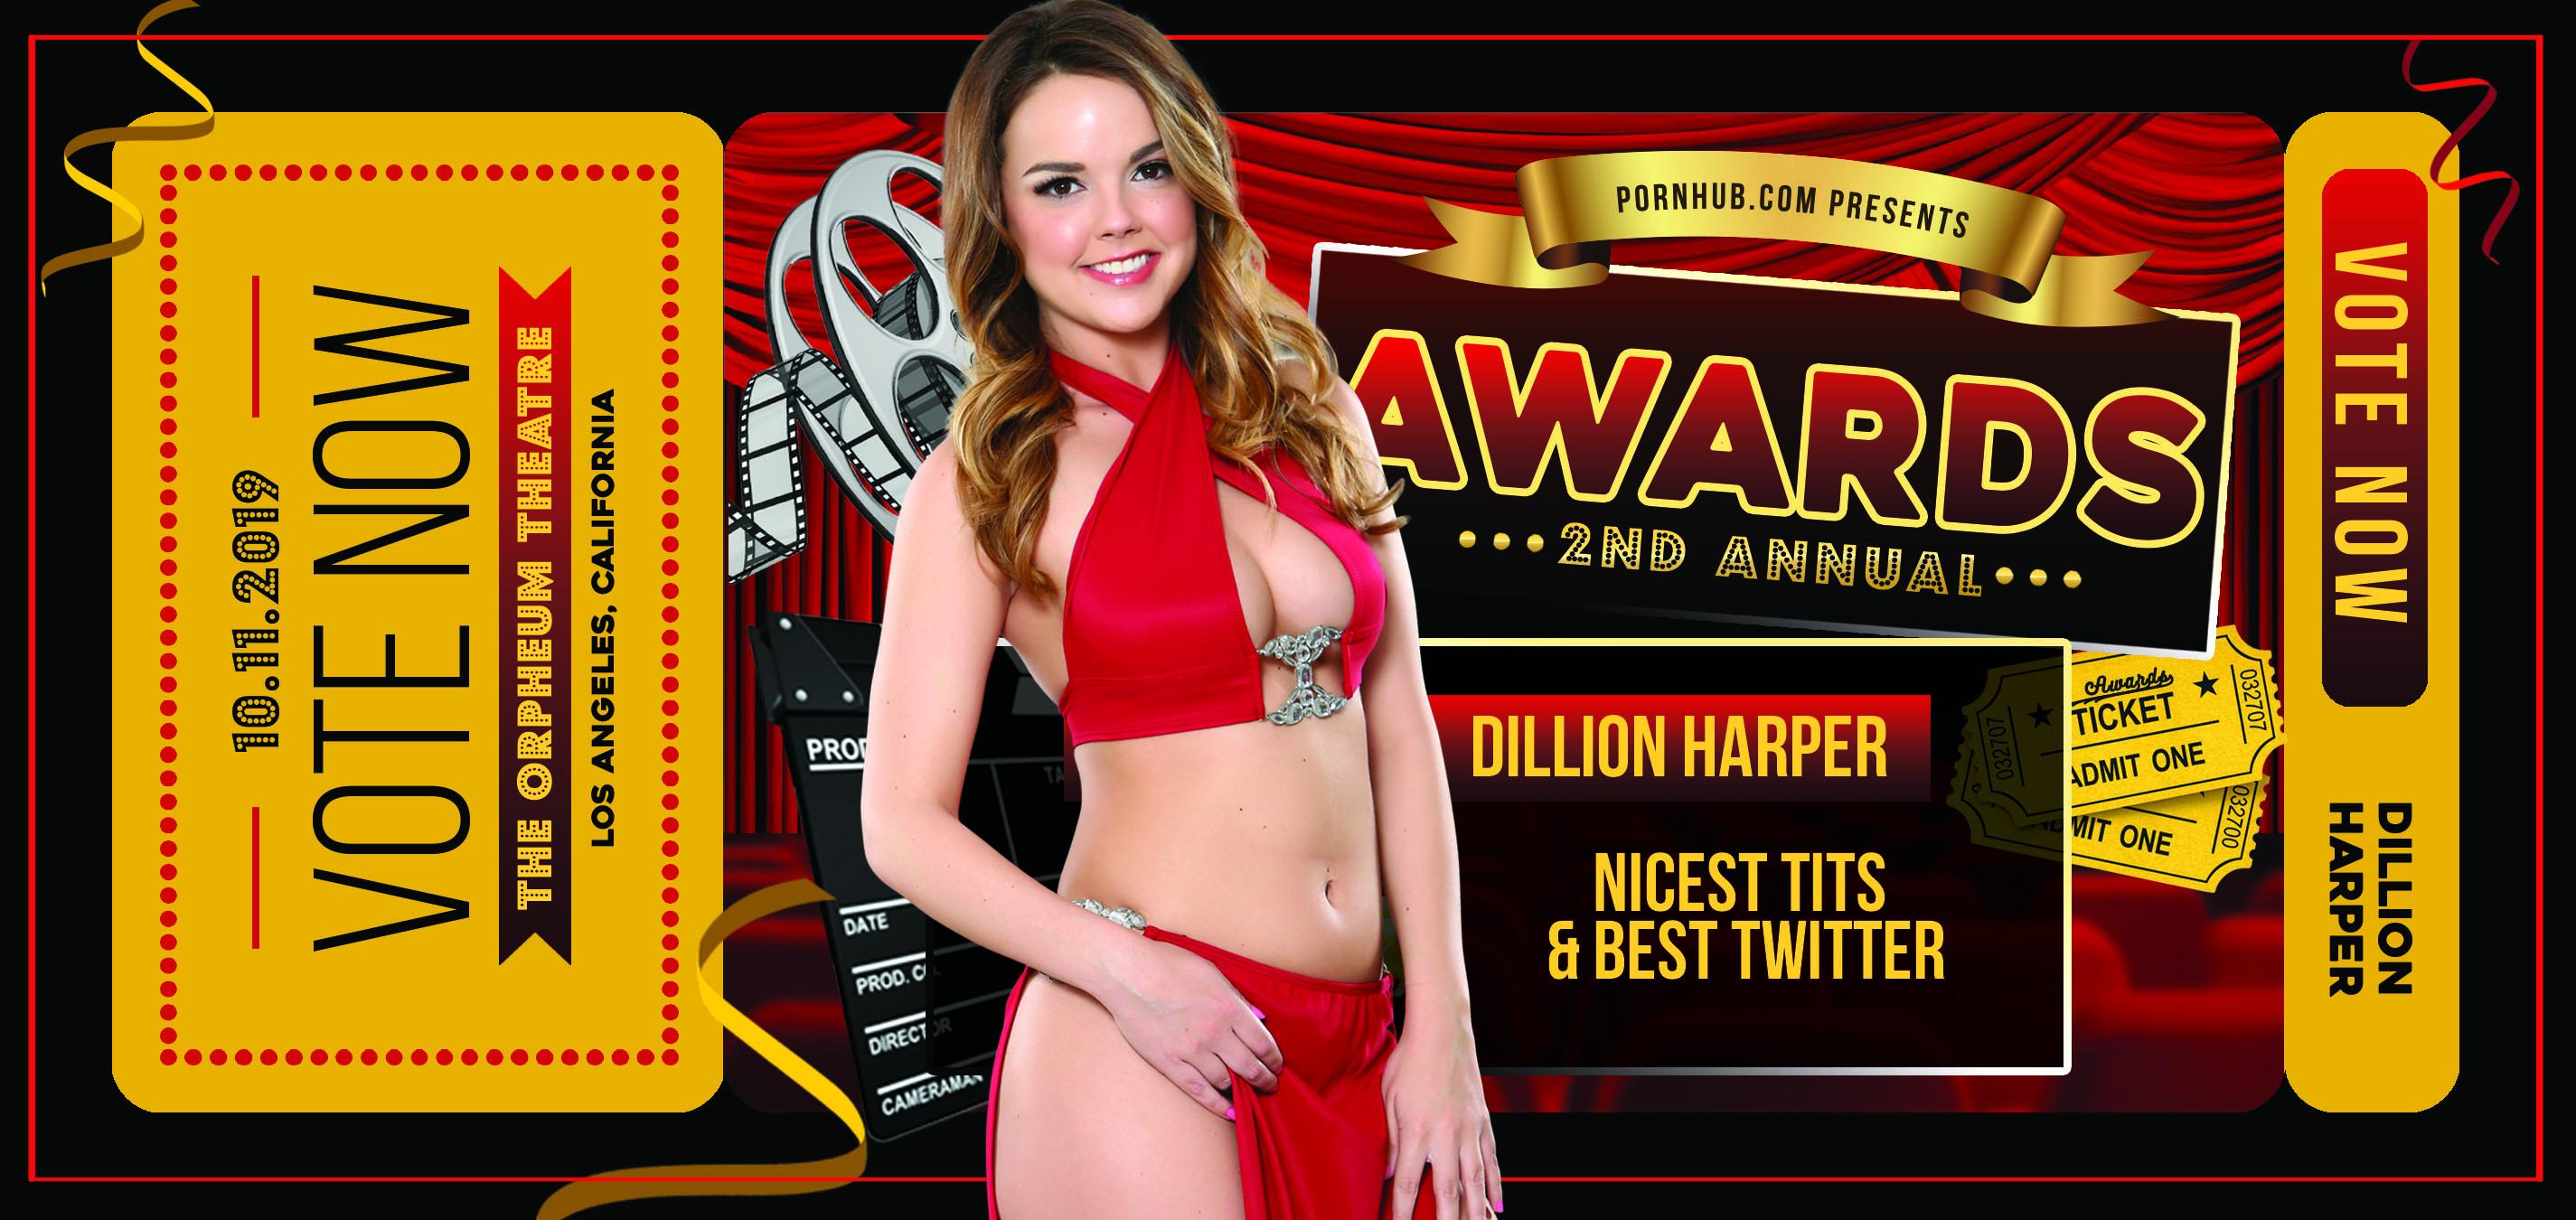 Dillion harper info